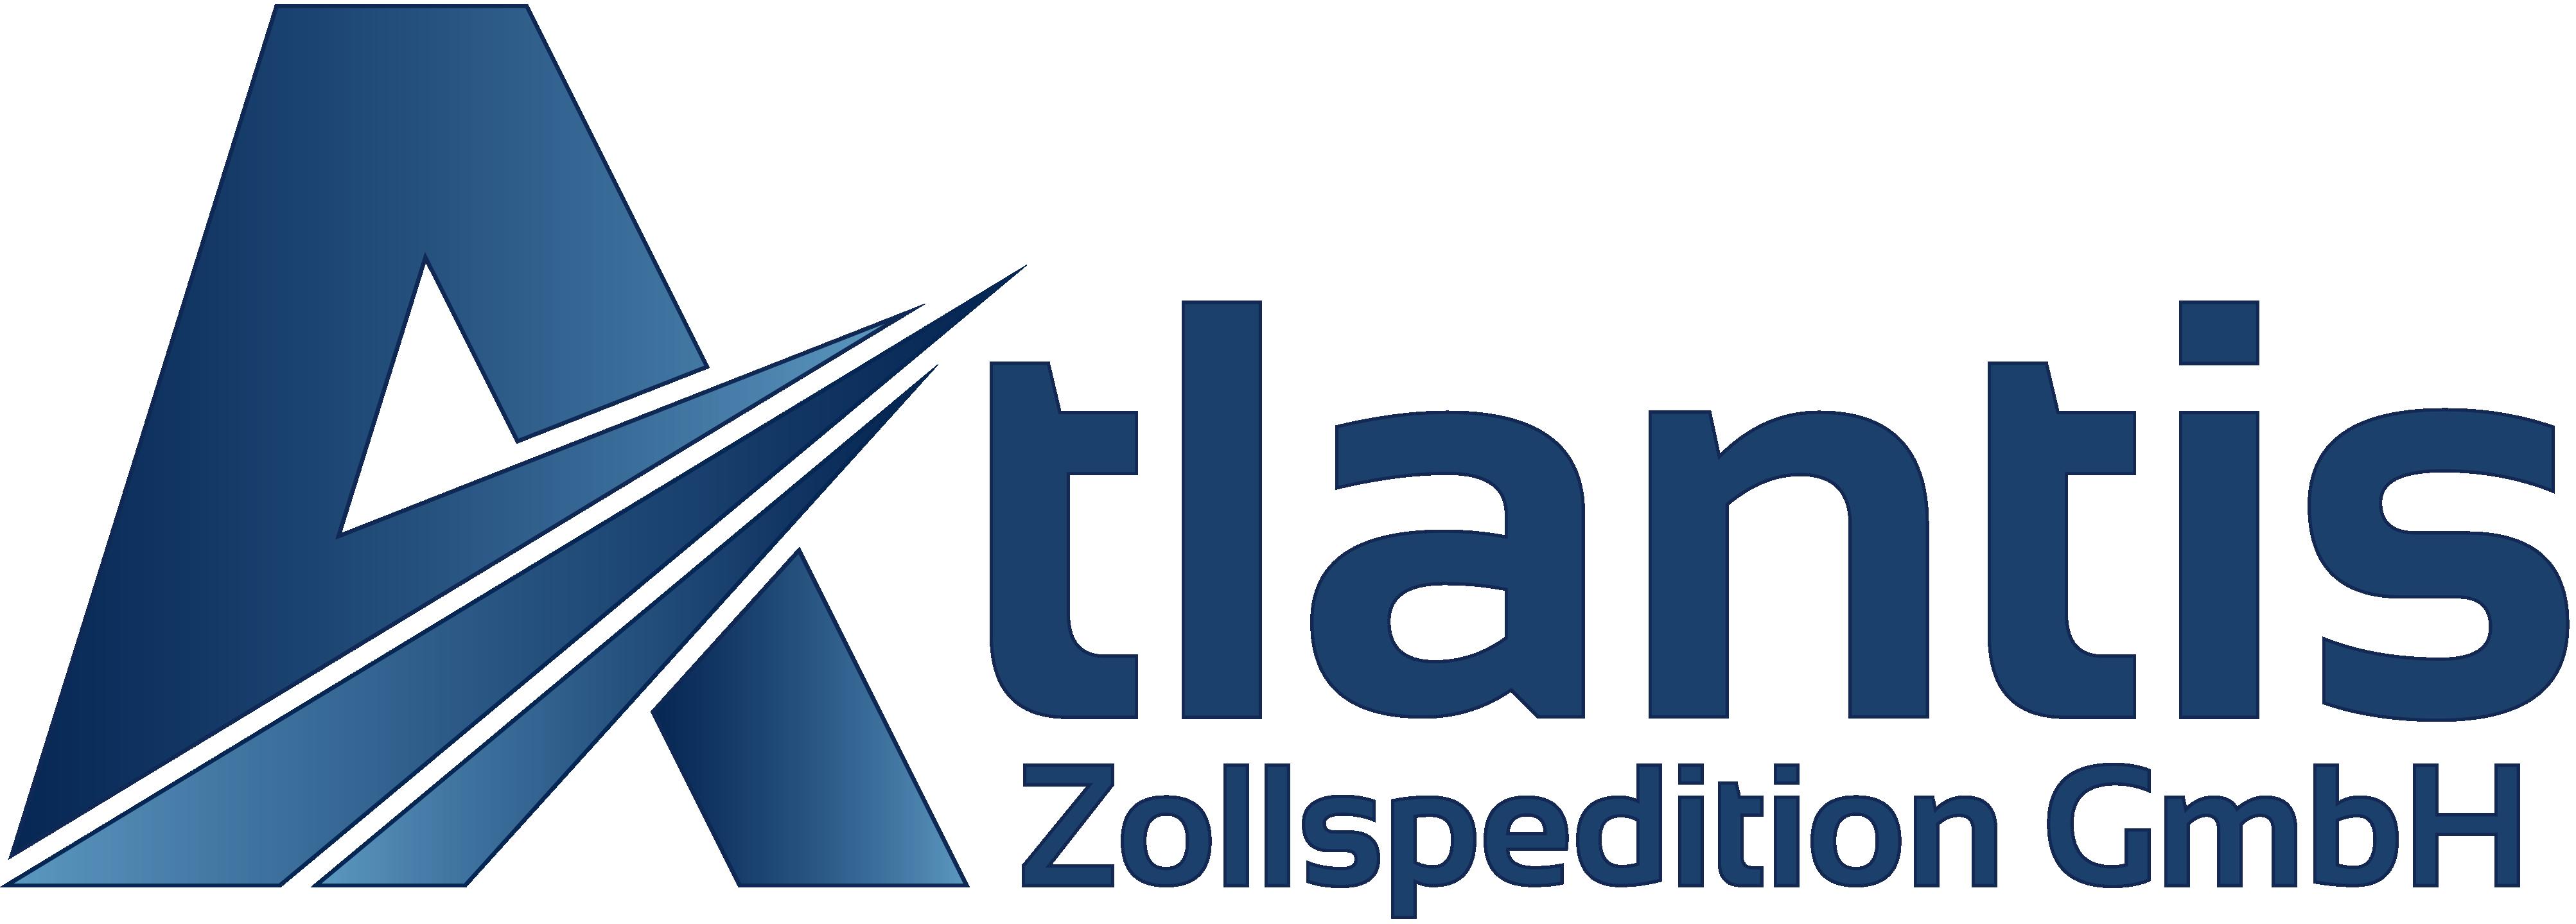 Atlantis Zollspedition GmbH